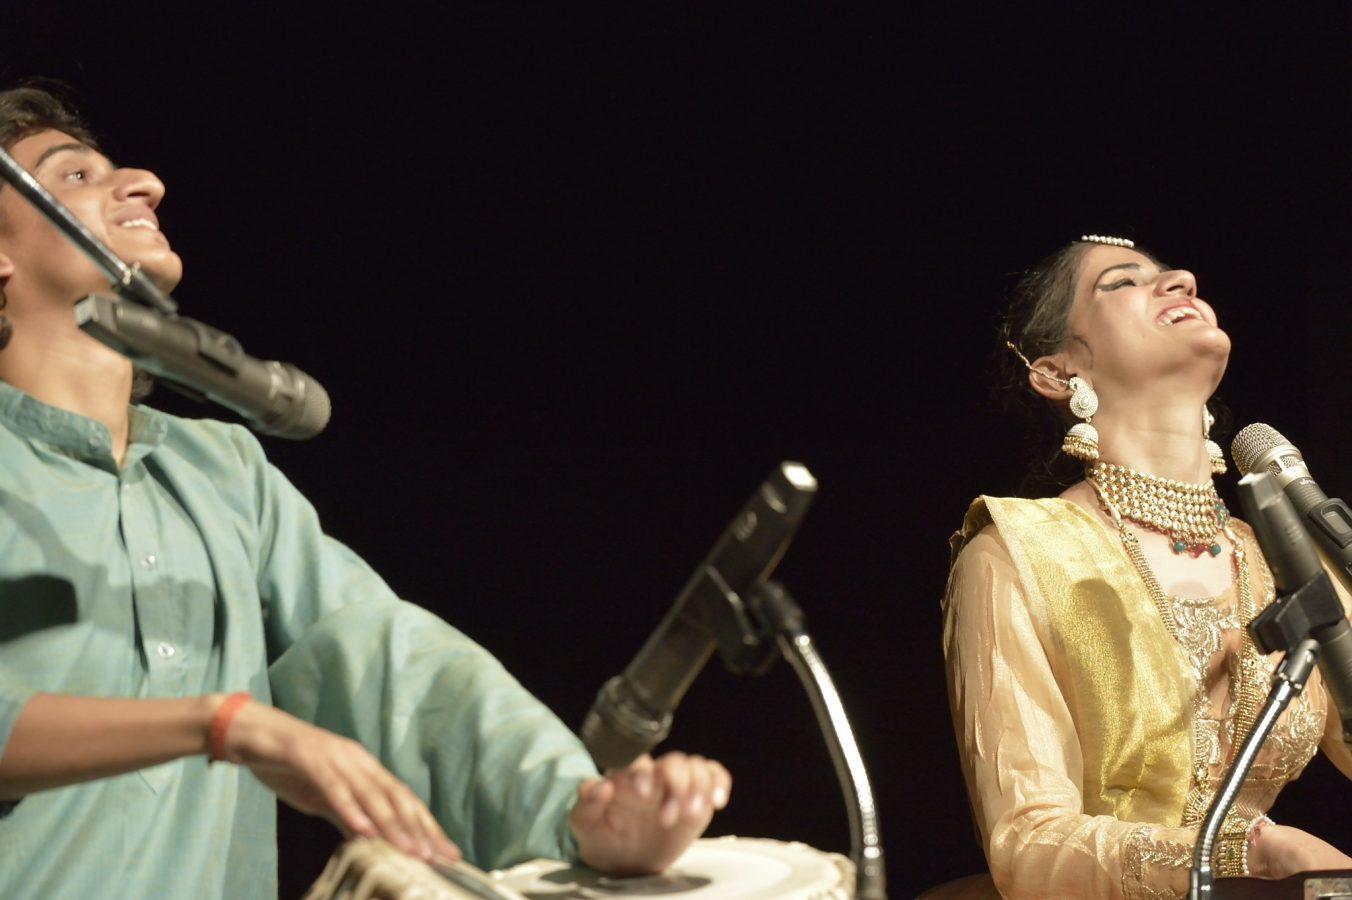 Akash and Awantika Dubey performing